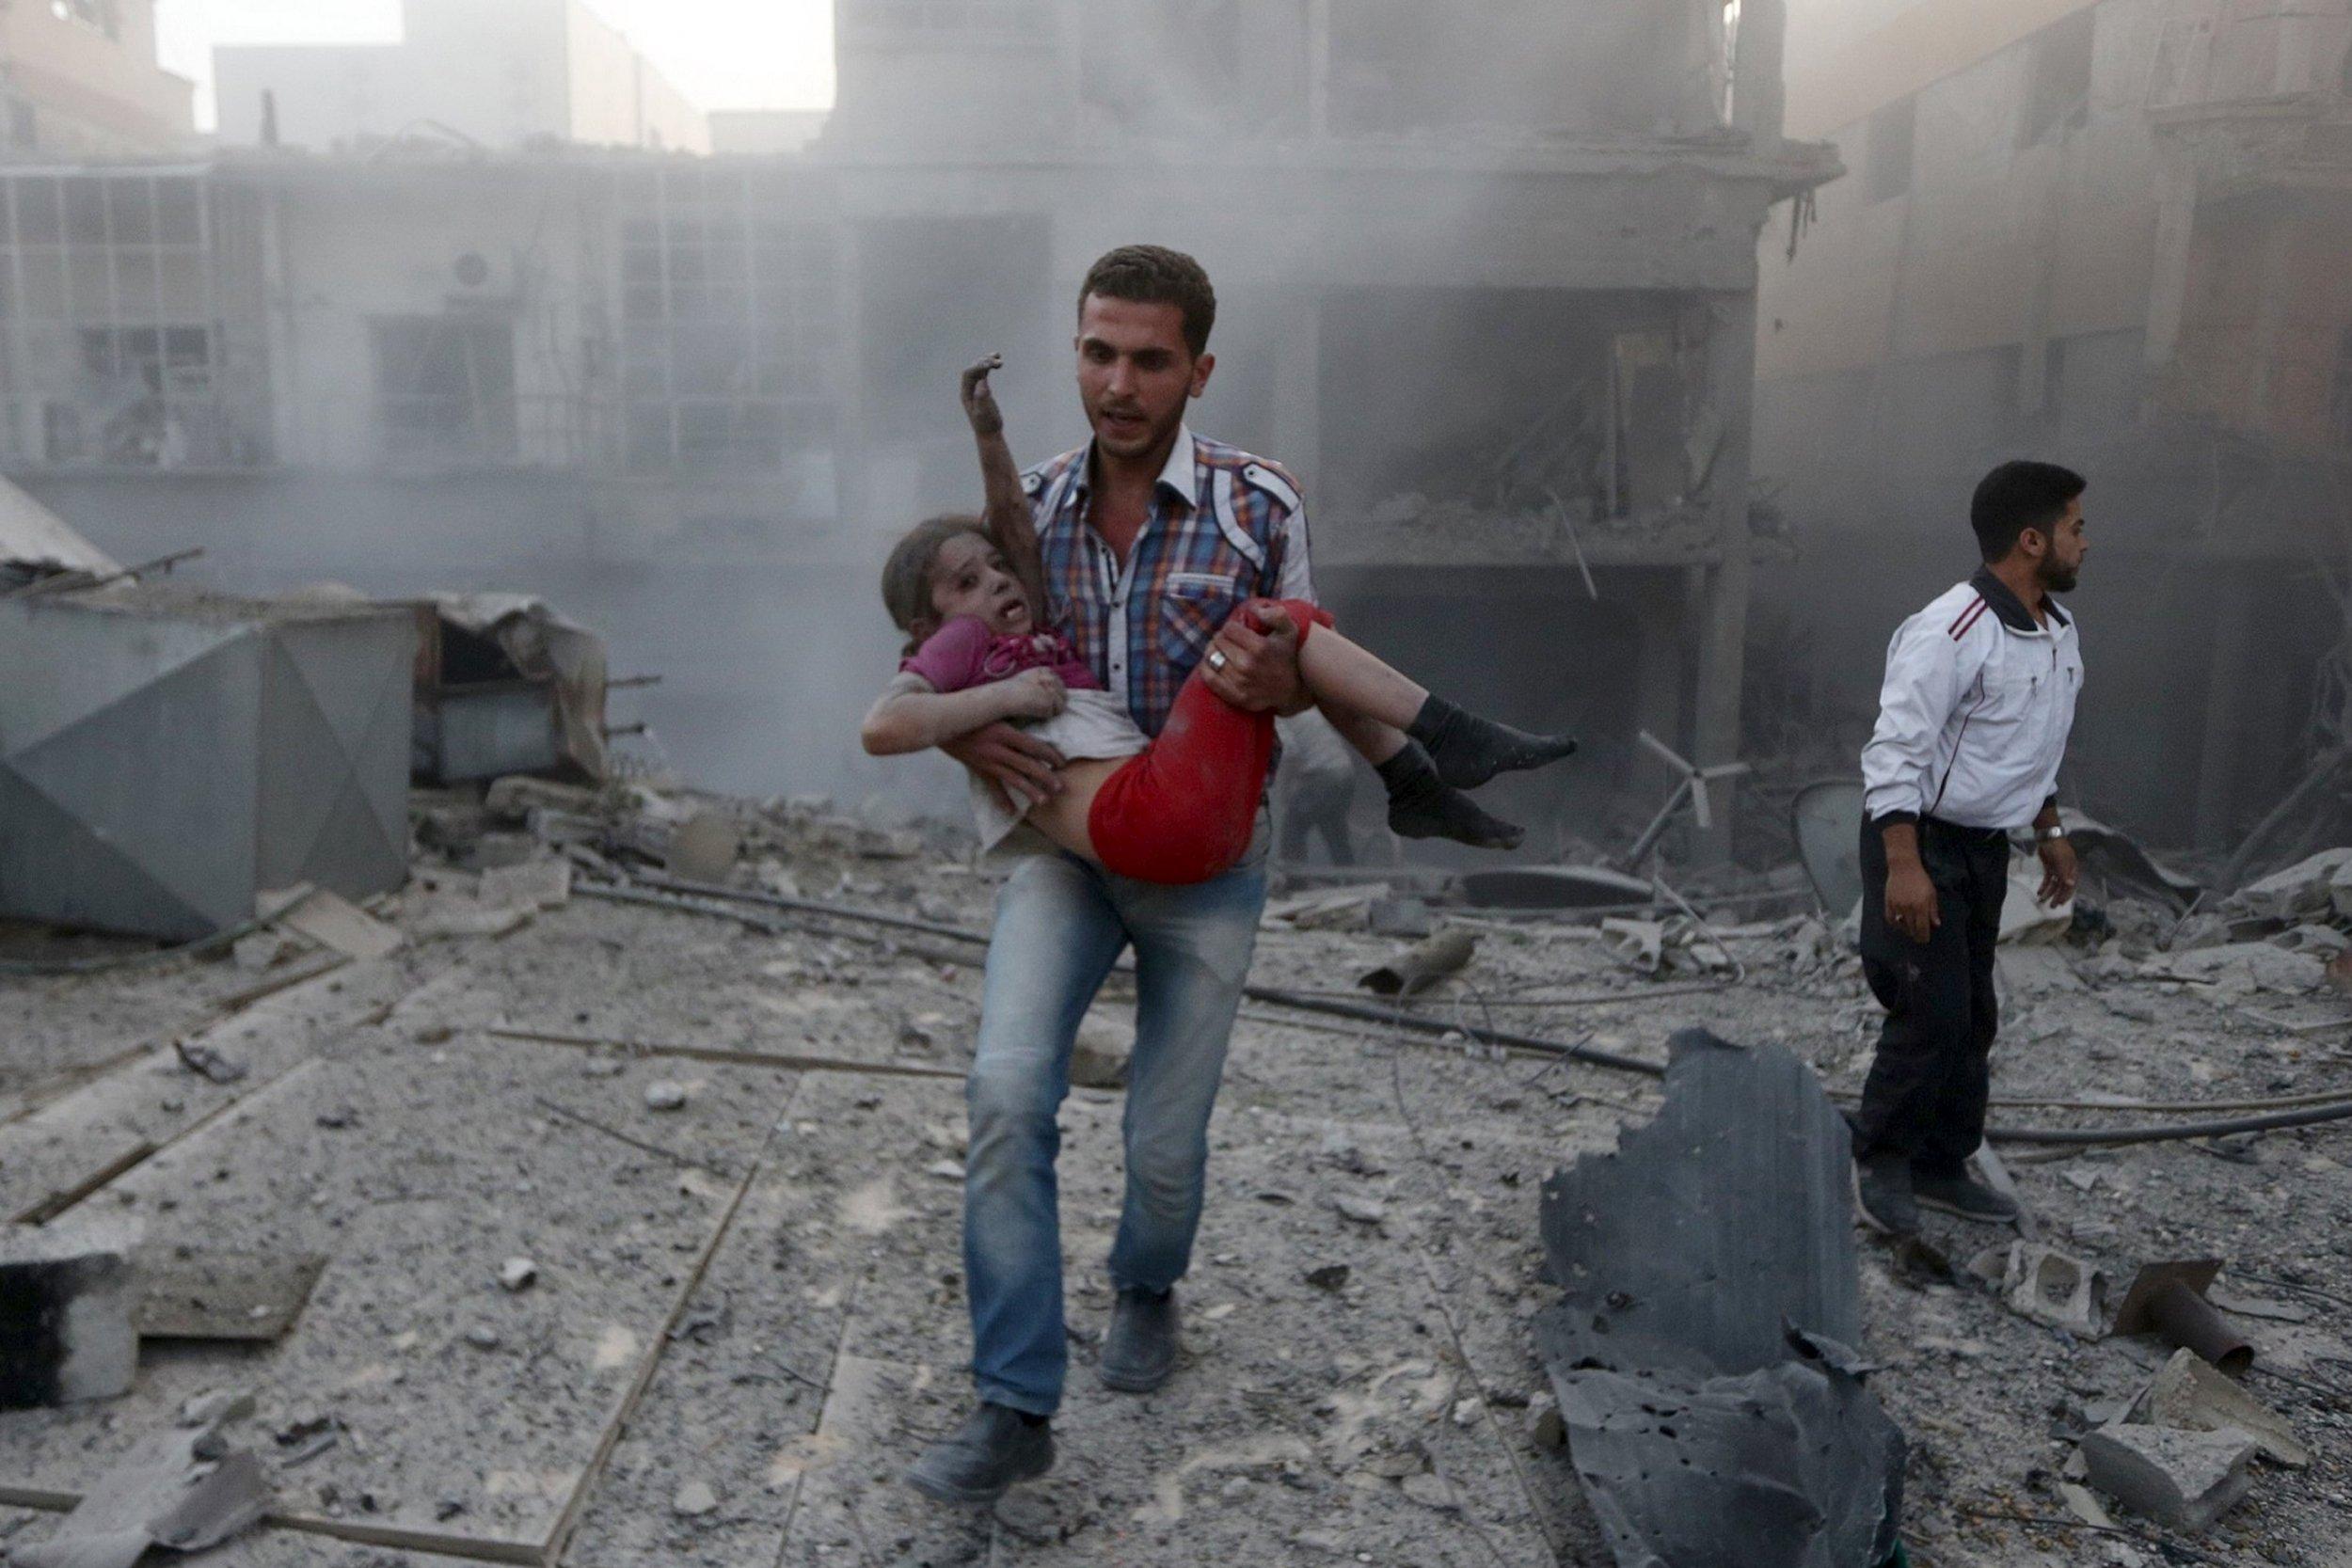 2015-06-16T222329Z_1_LYNXMPEB5F161_RTROPTP_4_MIDEAST-CRISIS-SYRIA